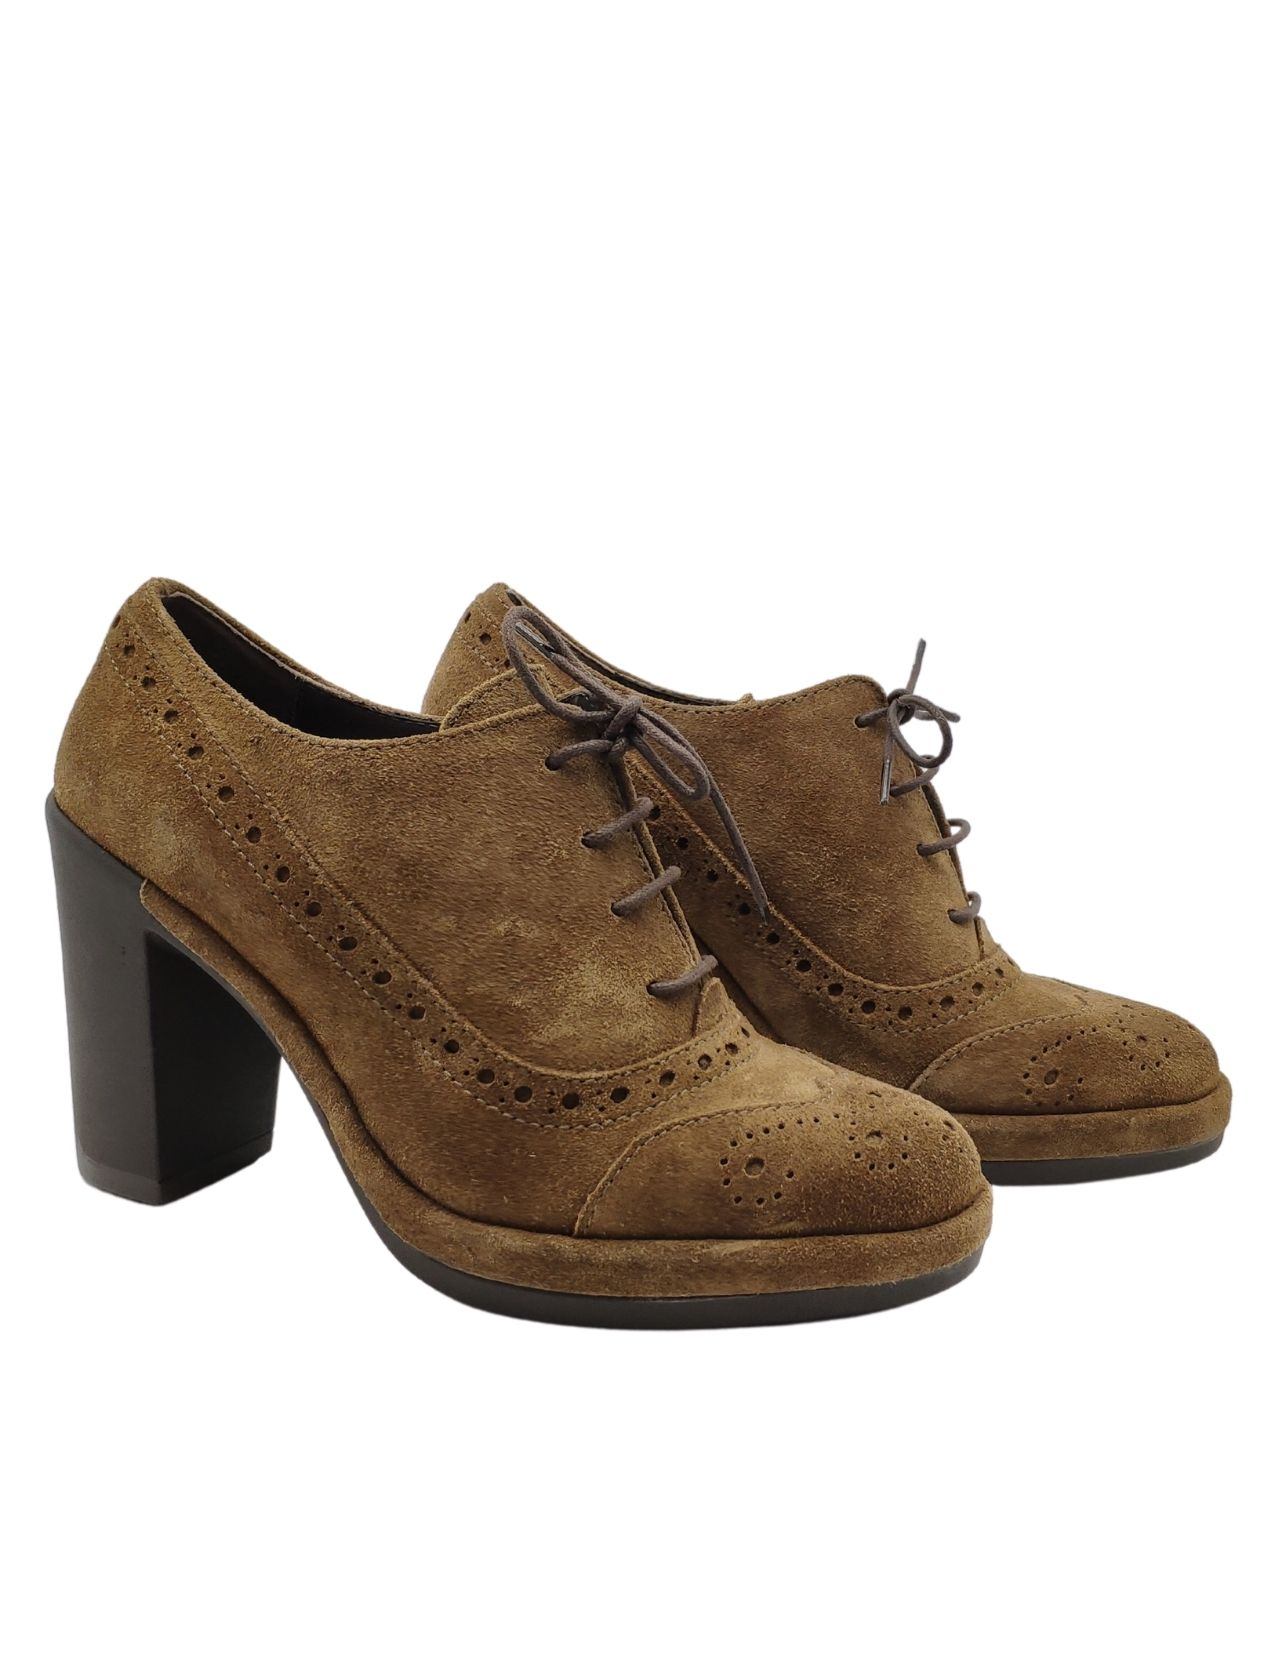 Lace-up High Heel Woman Gianni De Simone | Lace up shoes | 6206CUOIO